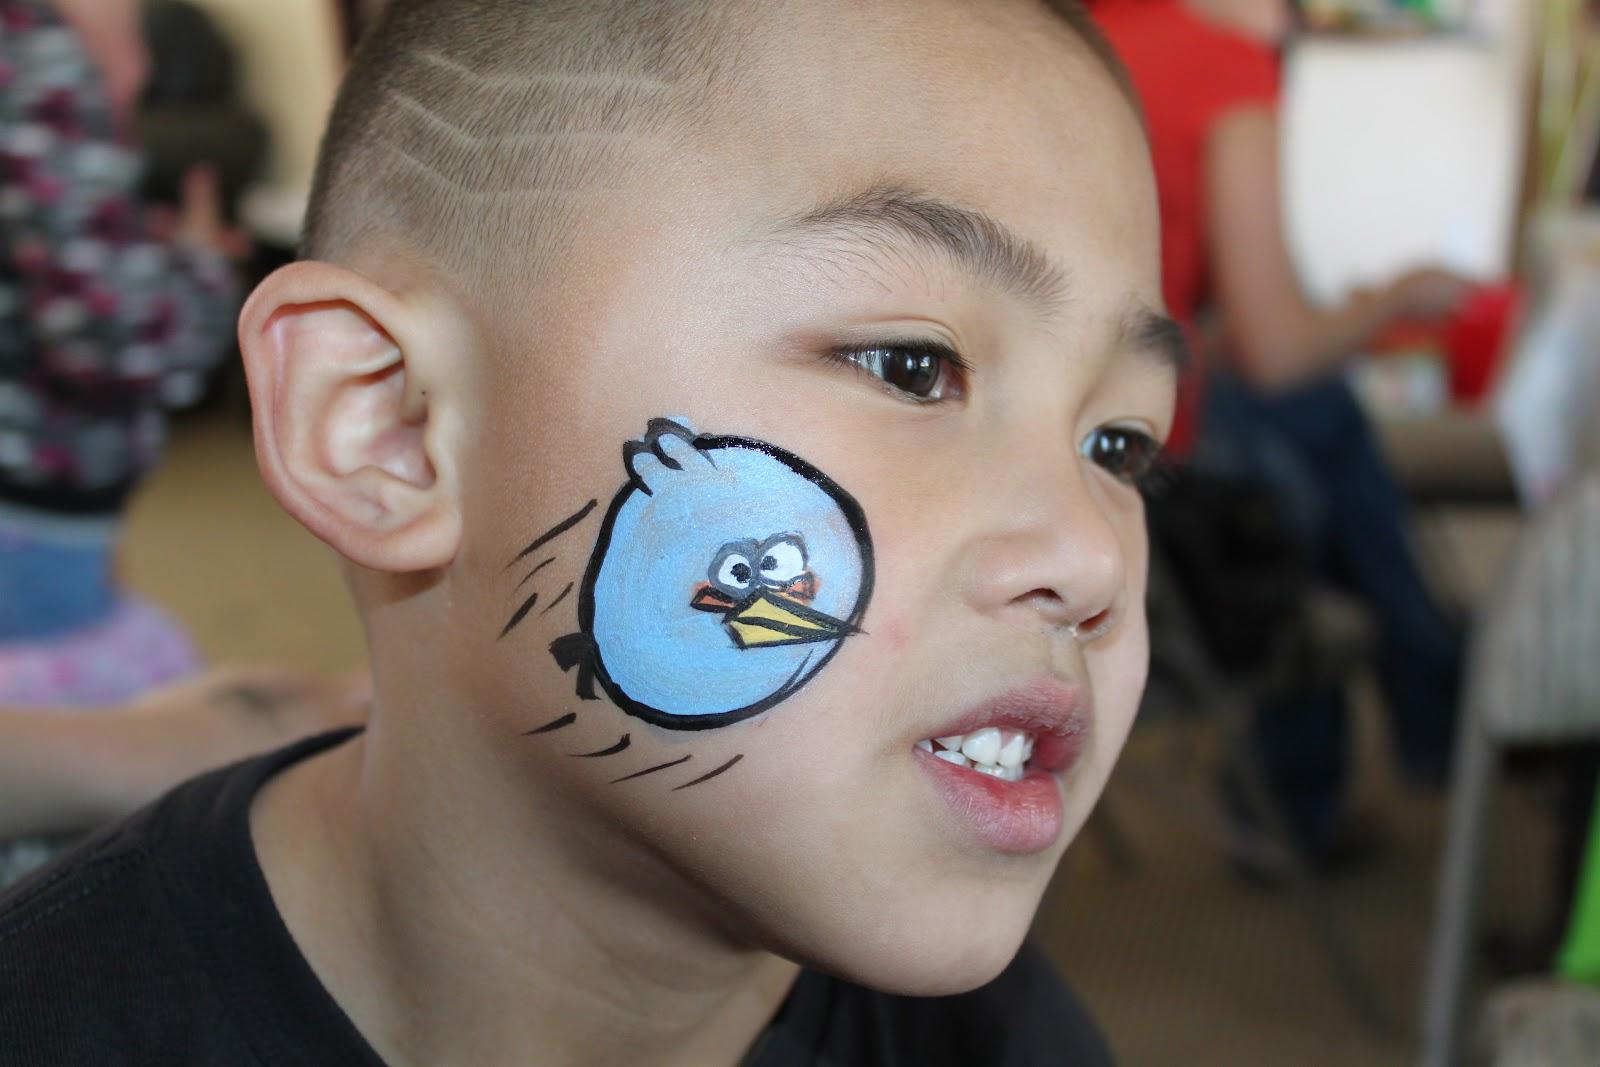 Lulu-Pop Face Painting: Angry Birds